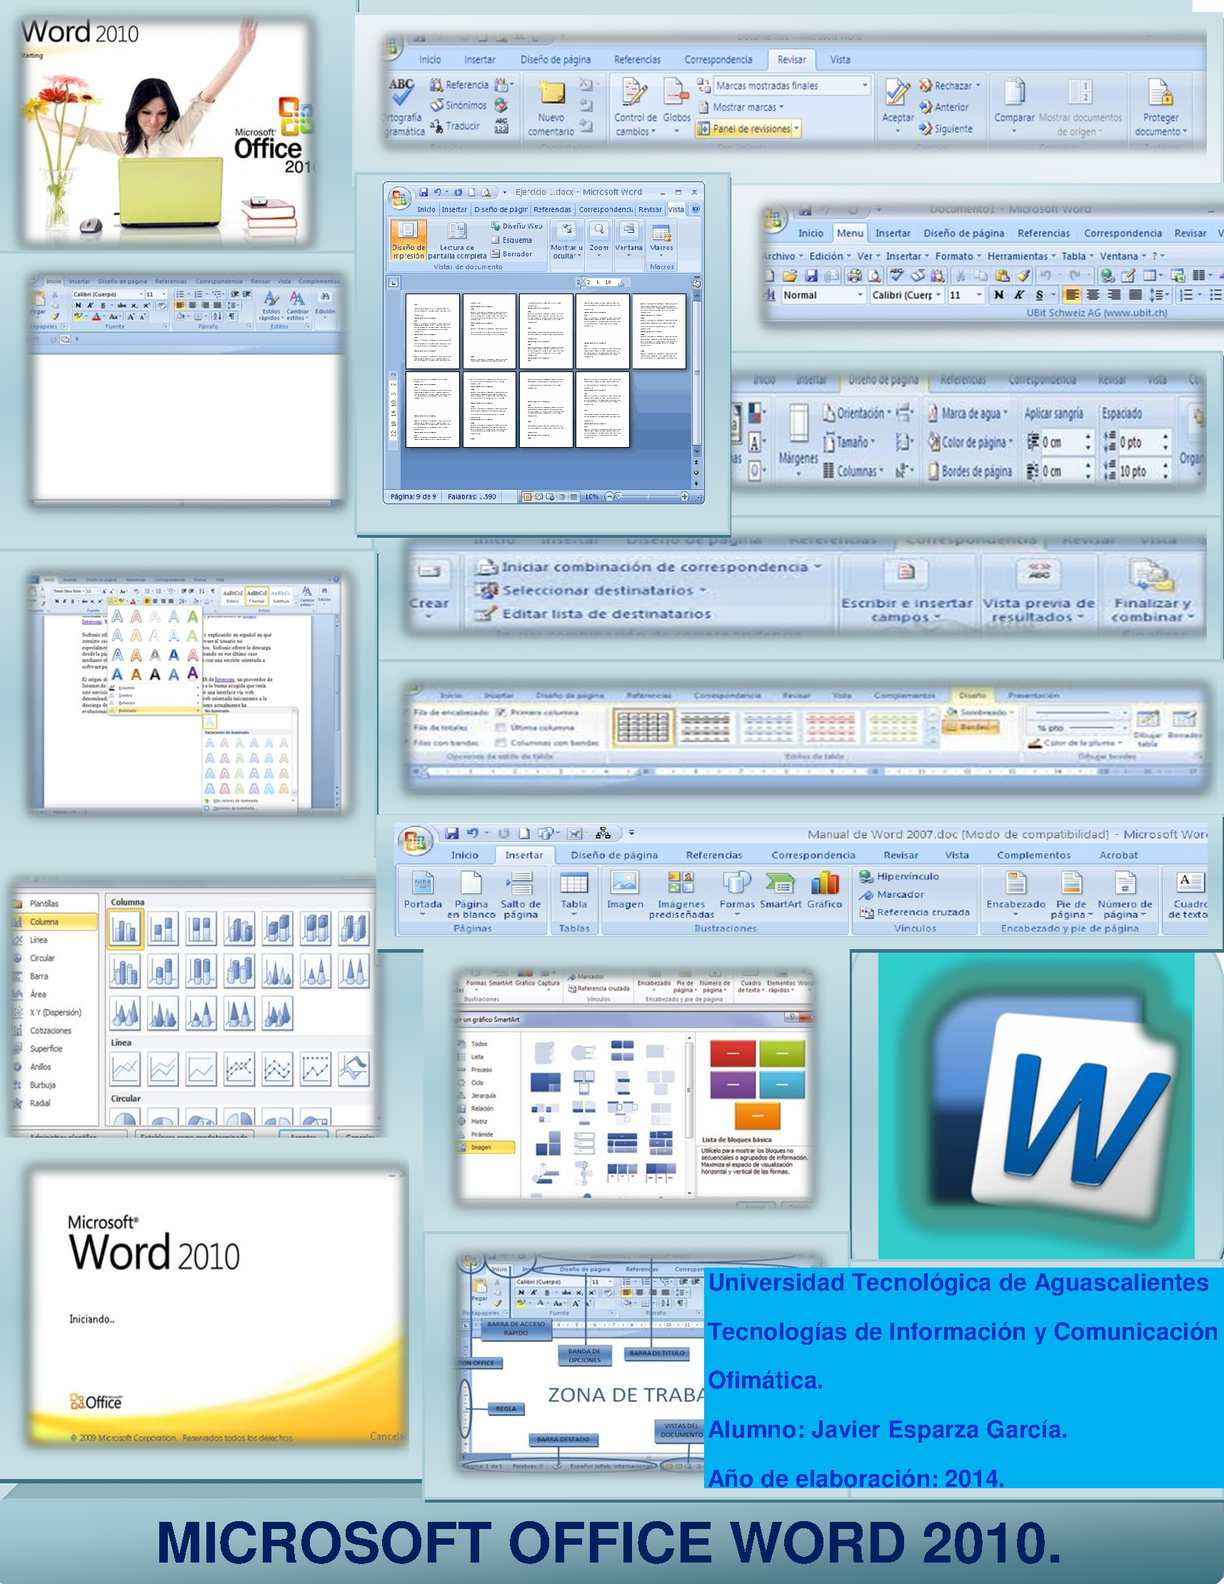 microsoft word 2010 downloads